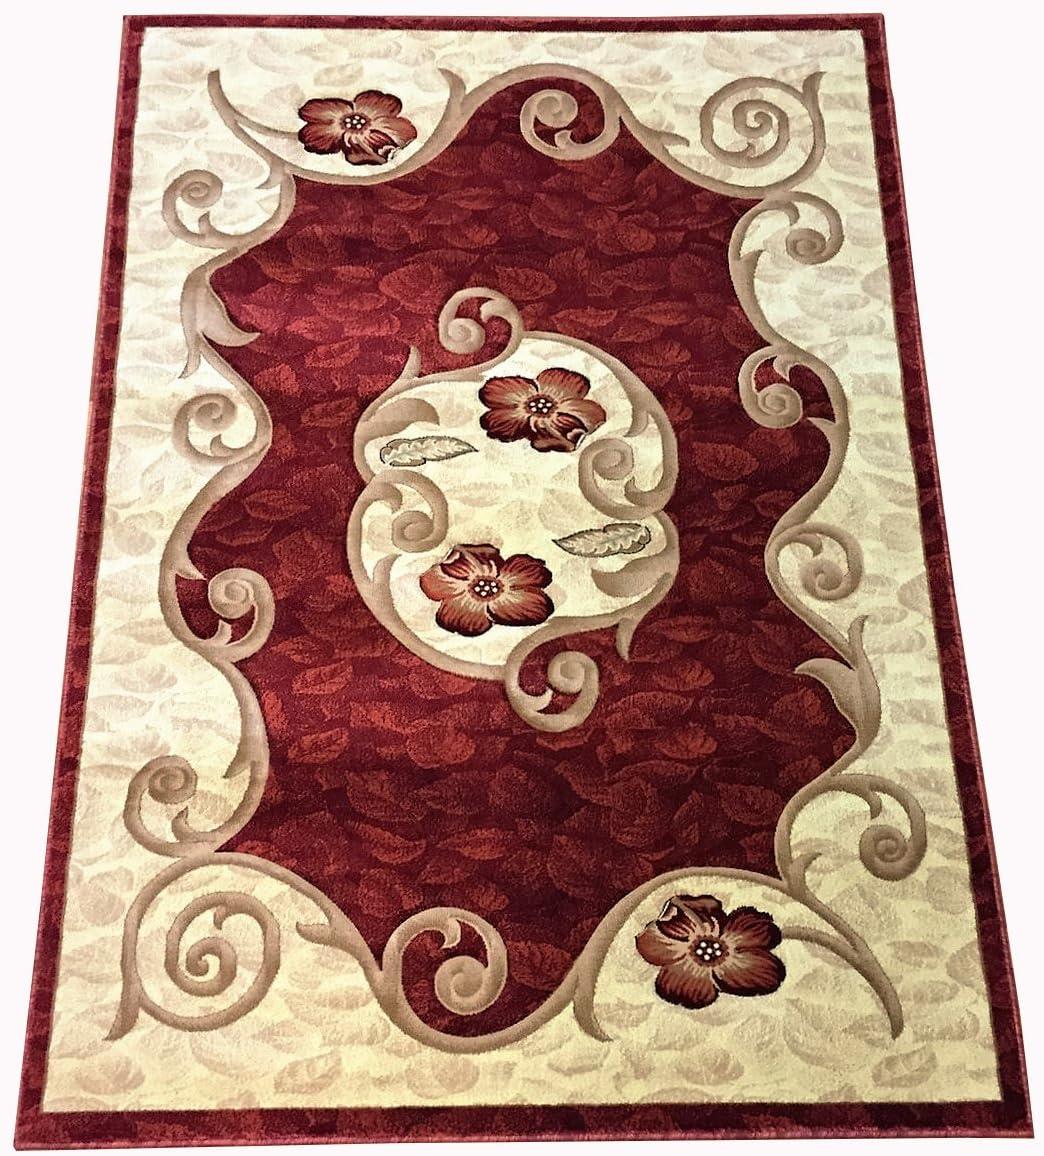 Modern Medallion Flower Design Carpet Burgundy Red Floral Contemporary Area Rug 8 11